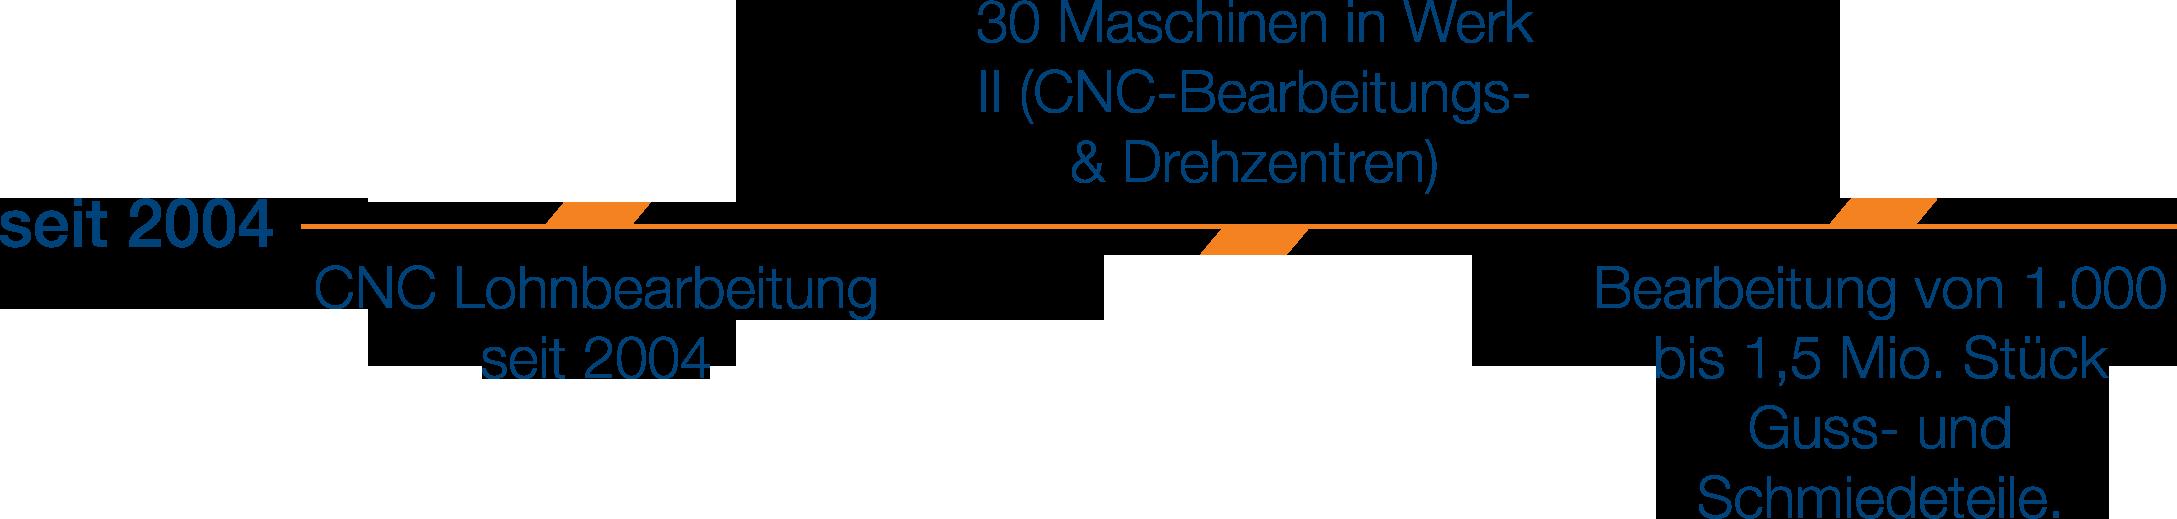 Amkon GmbH CNC Serienbearbeitung